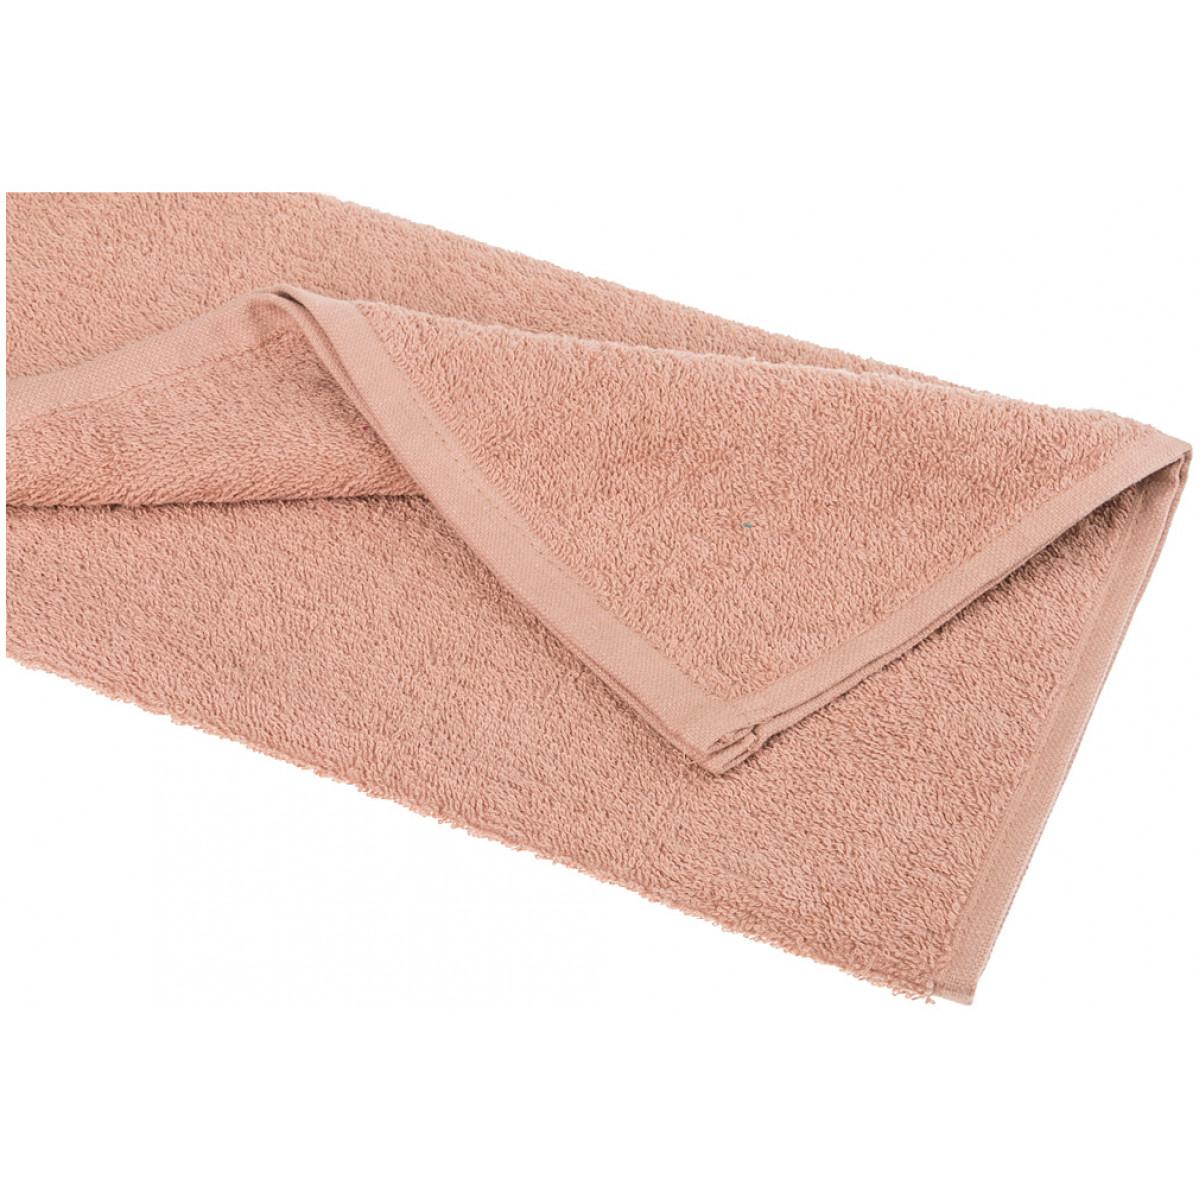 Полотенца Santalino Полотенце Lizzie  (40х70 см) полотенца santalino полотенце shulamite 40х70 см